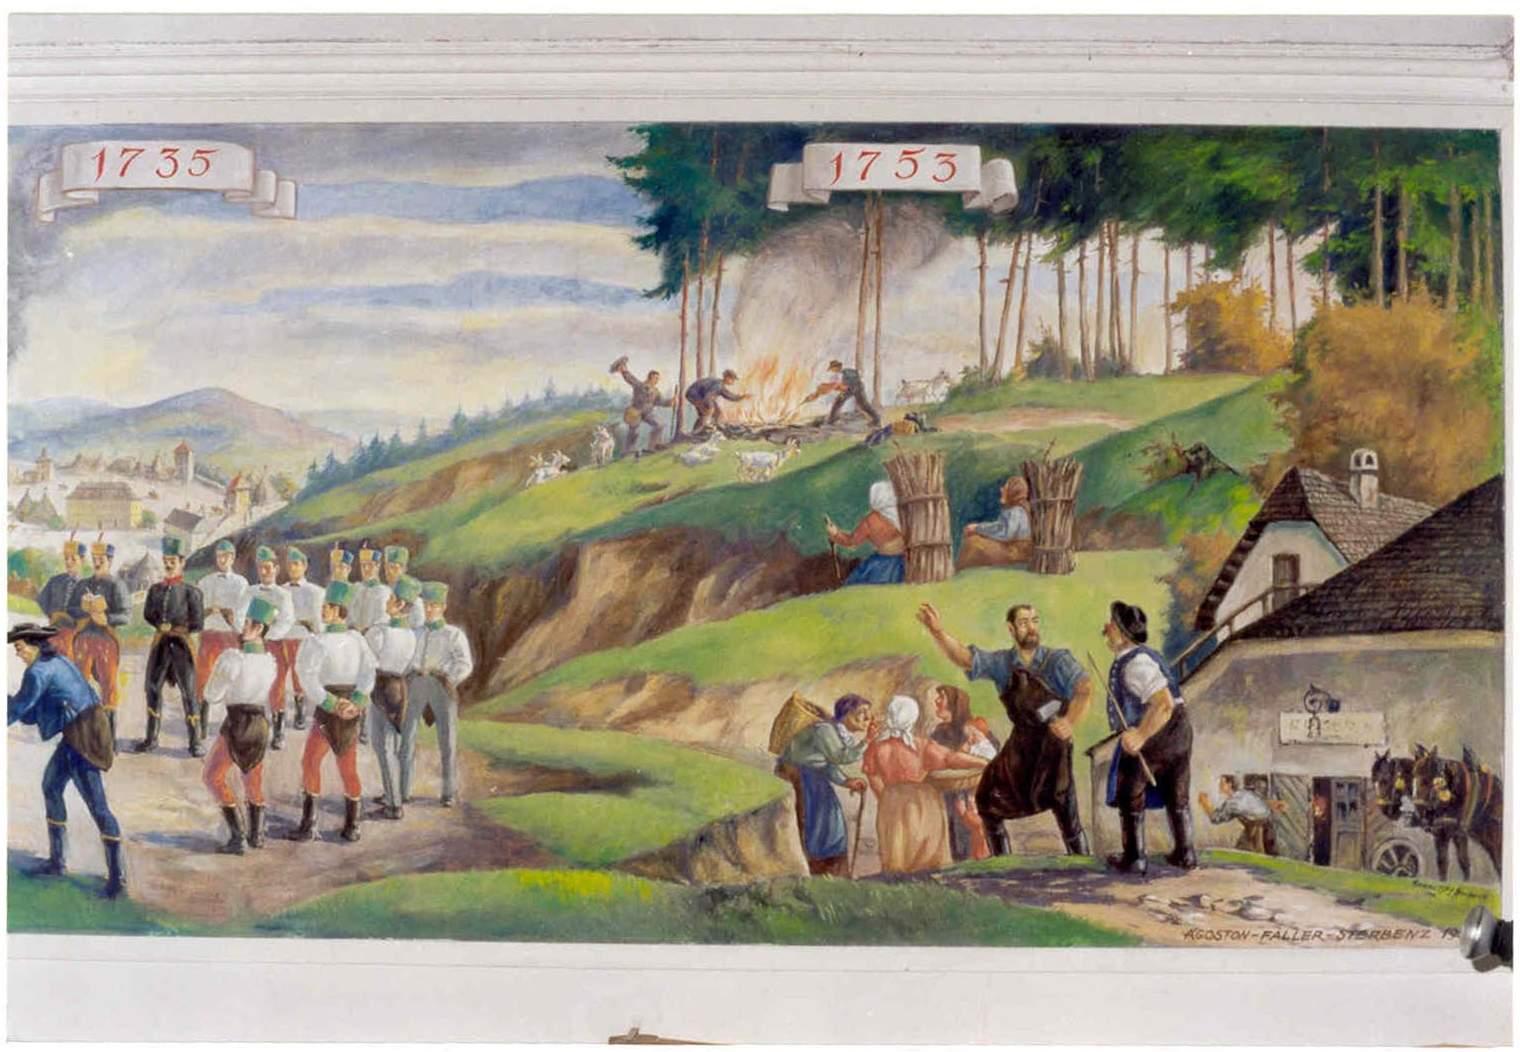 fresko-1735_a_brennbergi_szen_megtalalasa_agoston-faller-sterbenz-fele.jpg